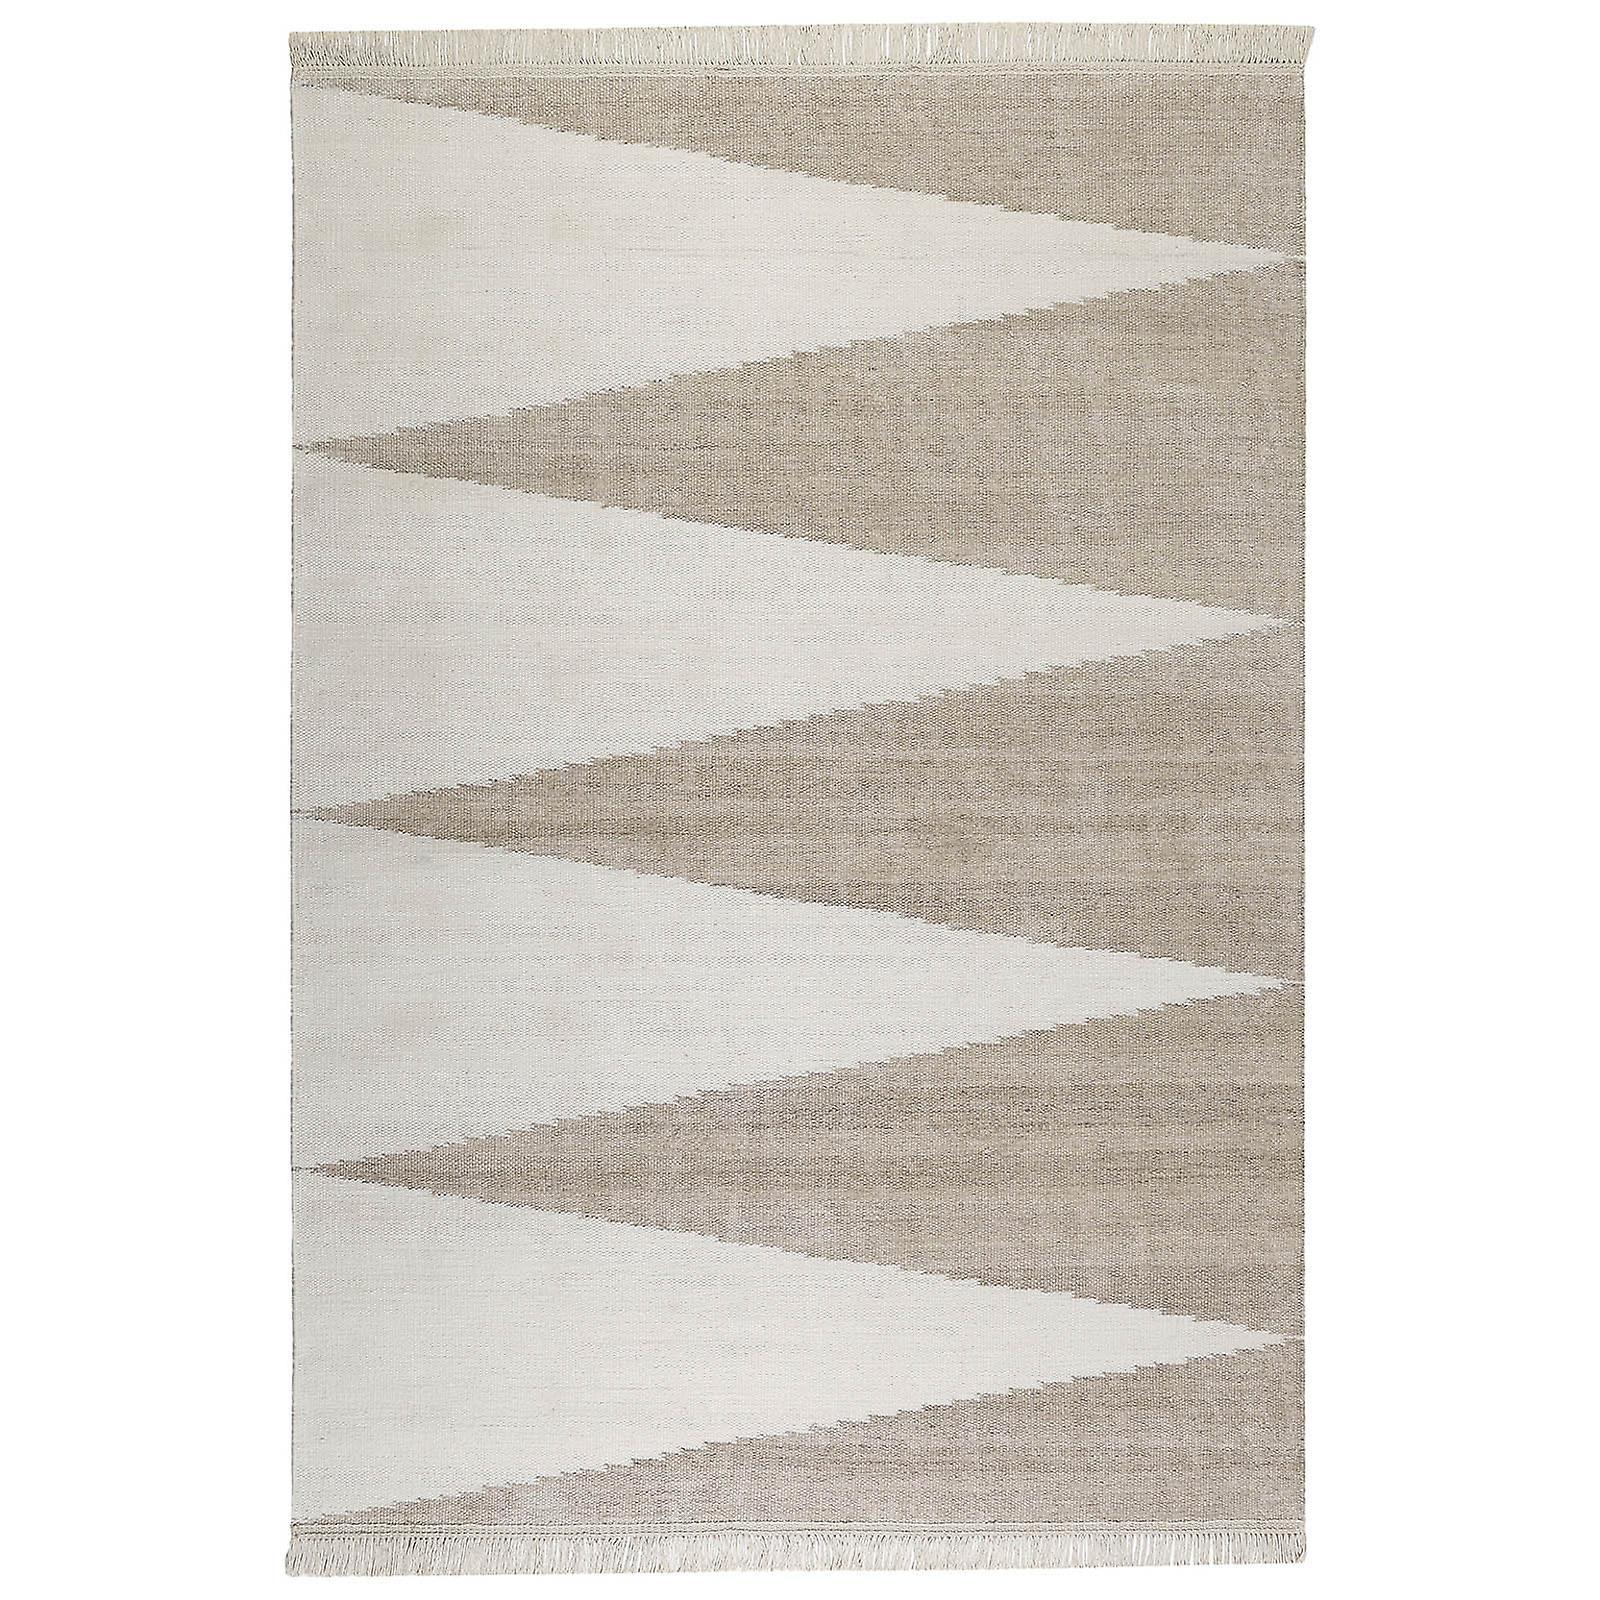 Smart Triangle Rugs 0002 04 By Carpets & Co In Beige